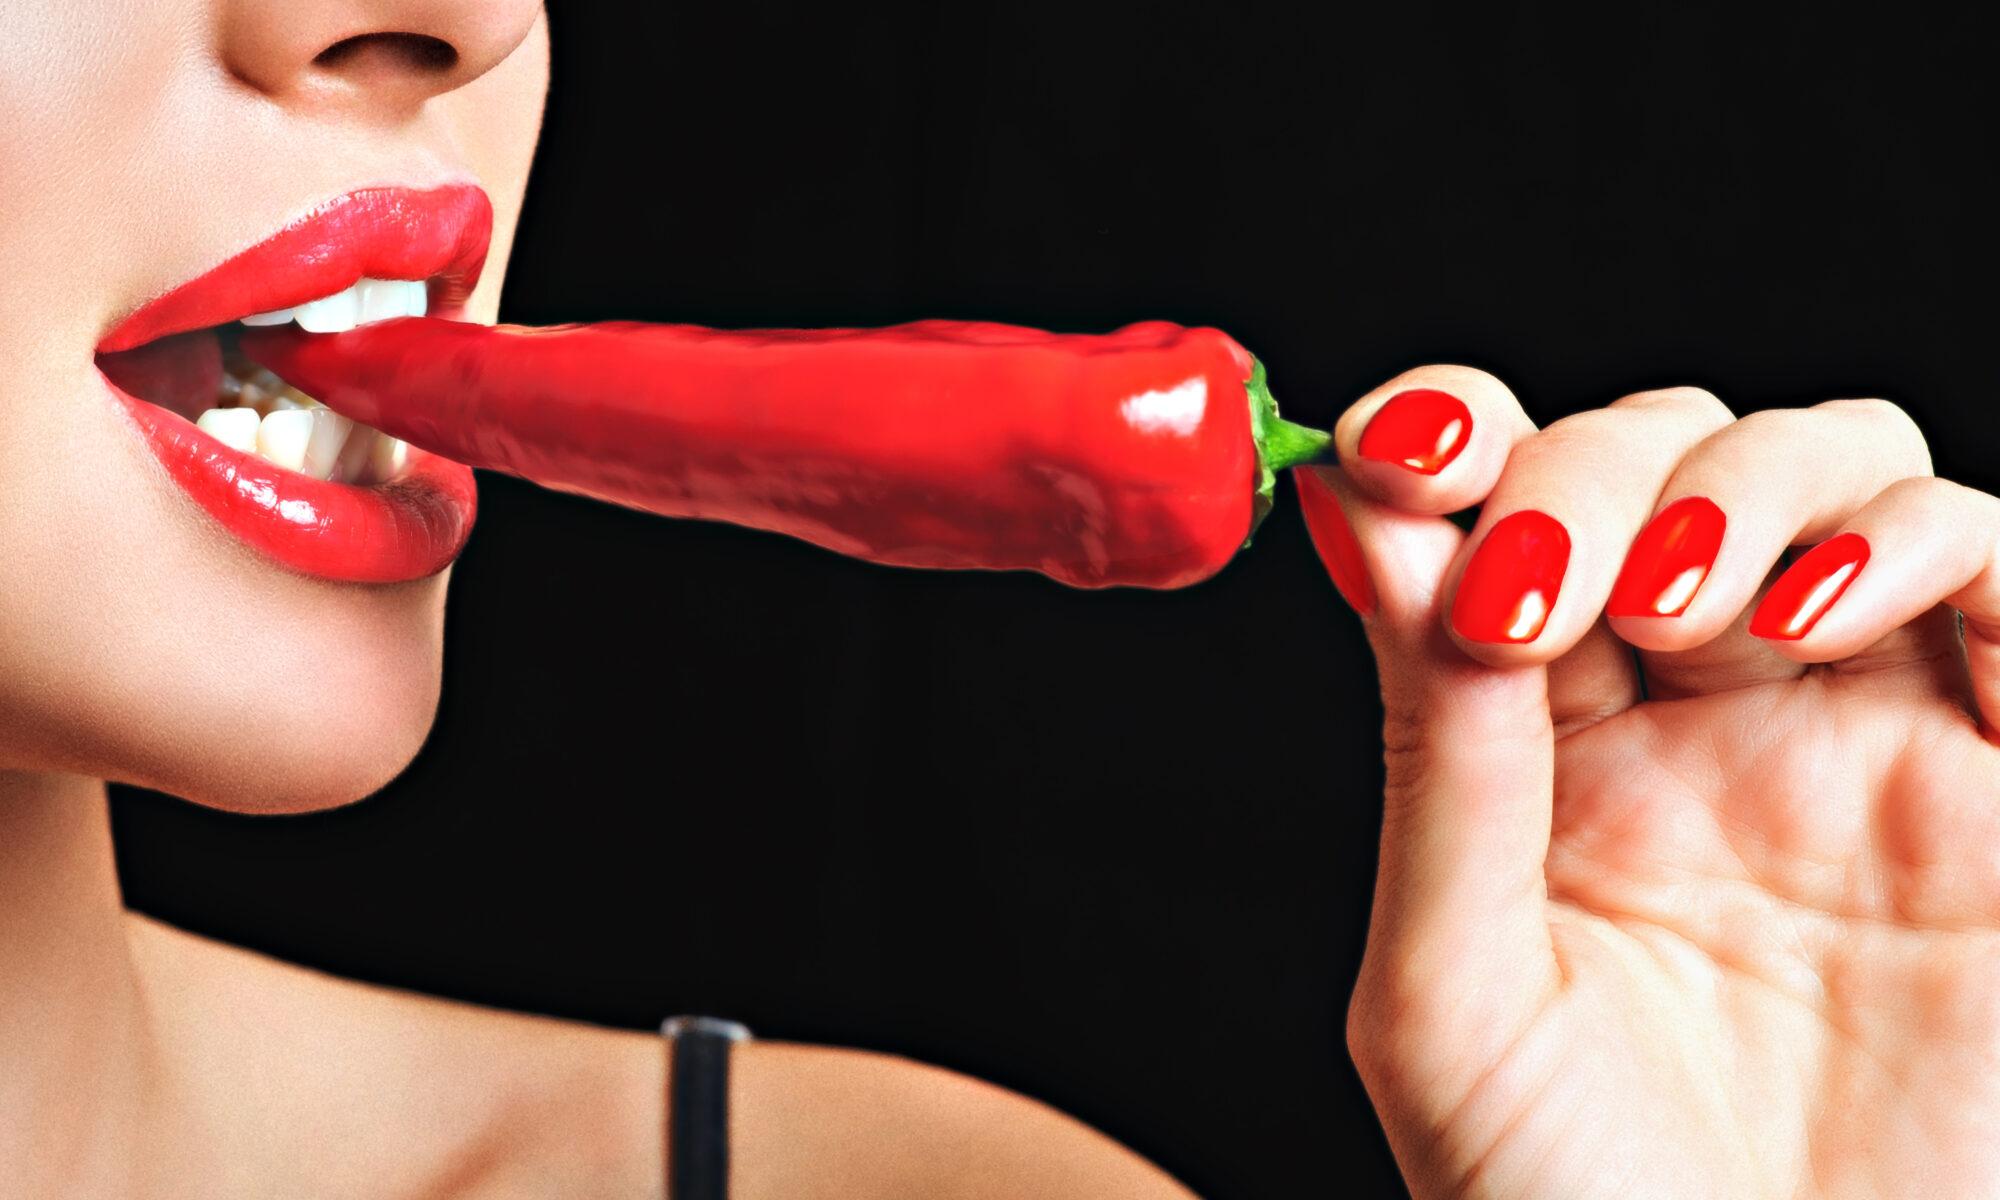 Frau mir roten Lippen beißt auf rote Pepperoni